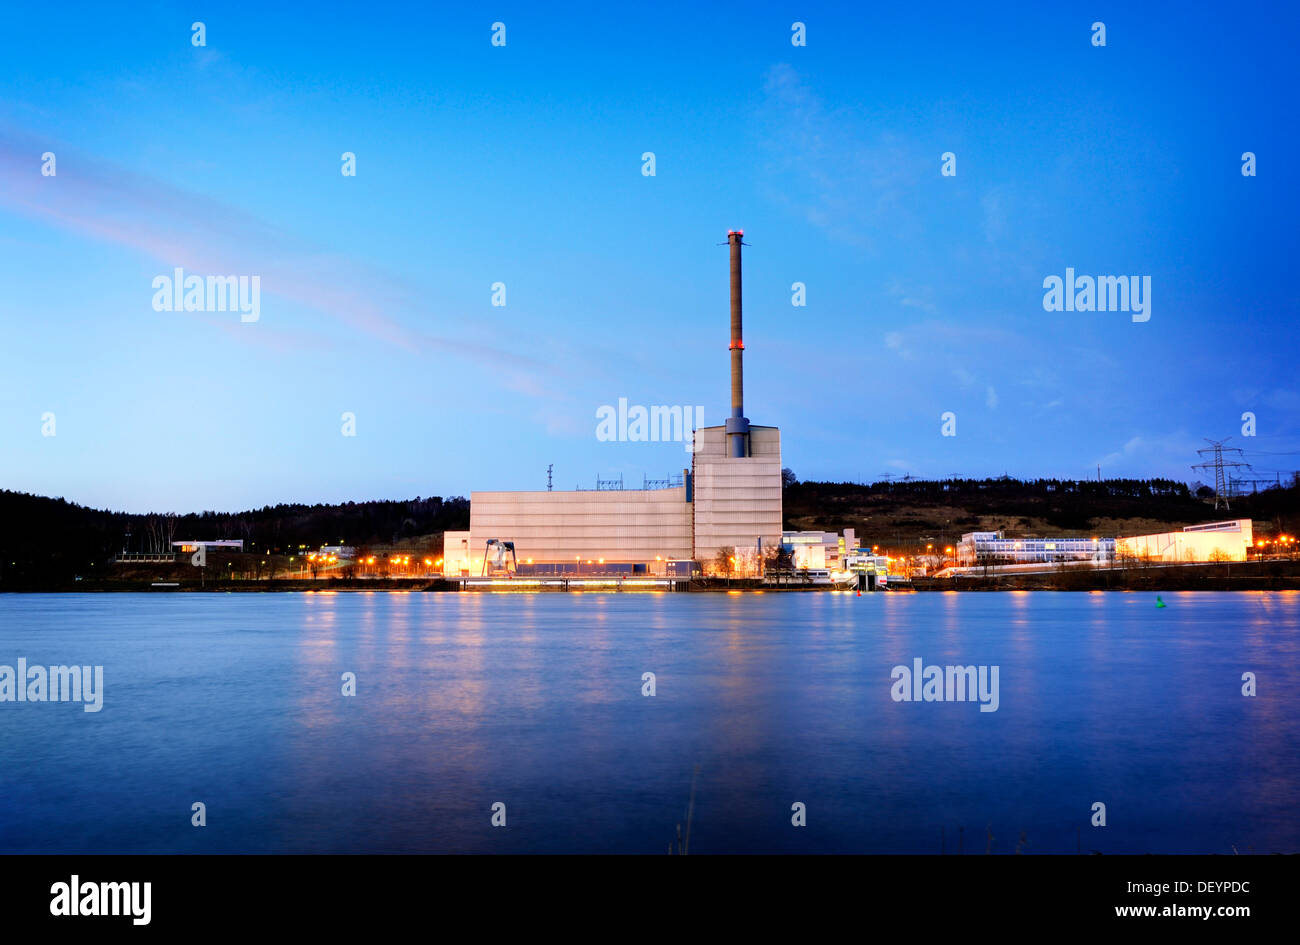 Kruemmel Nuclear Power Plant in Geesthacht, Schleswig-Holstein - Stock Image